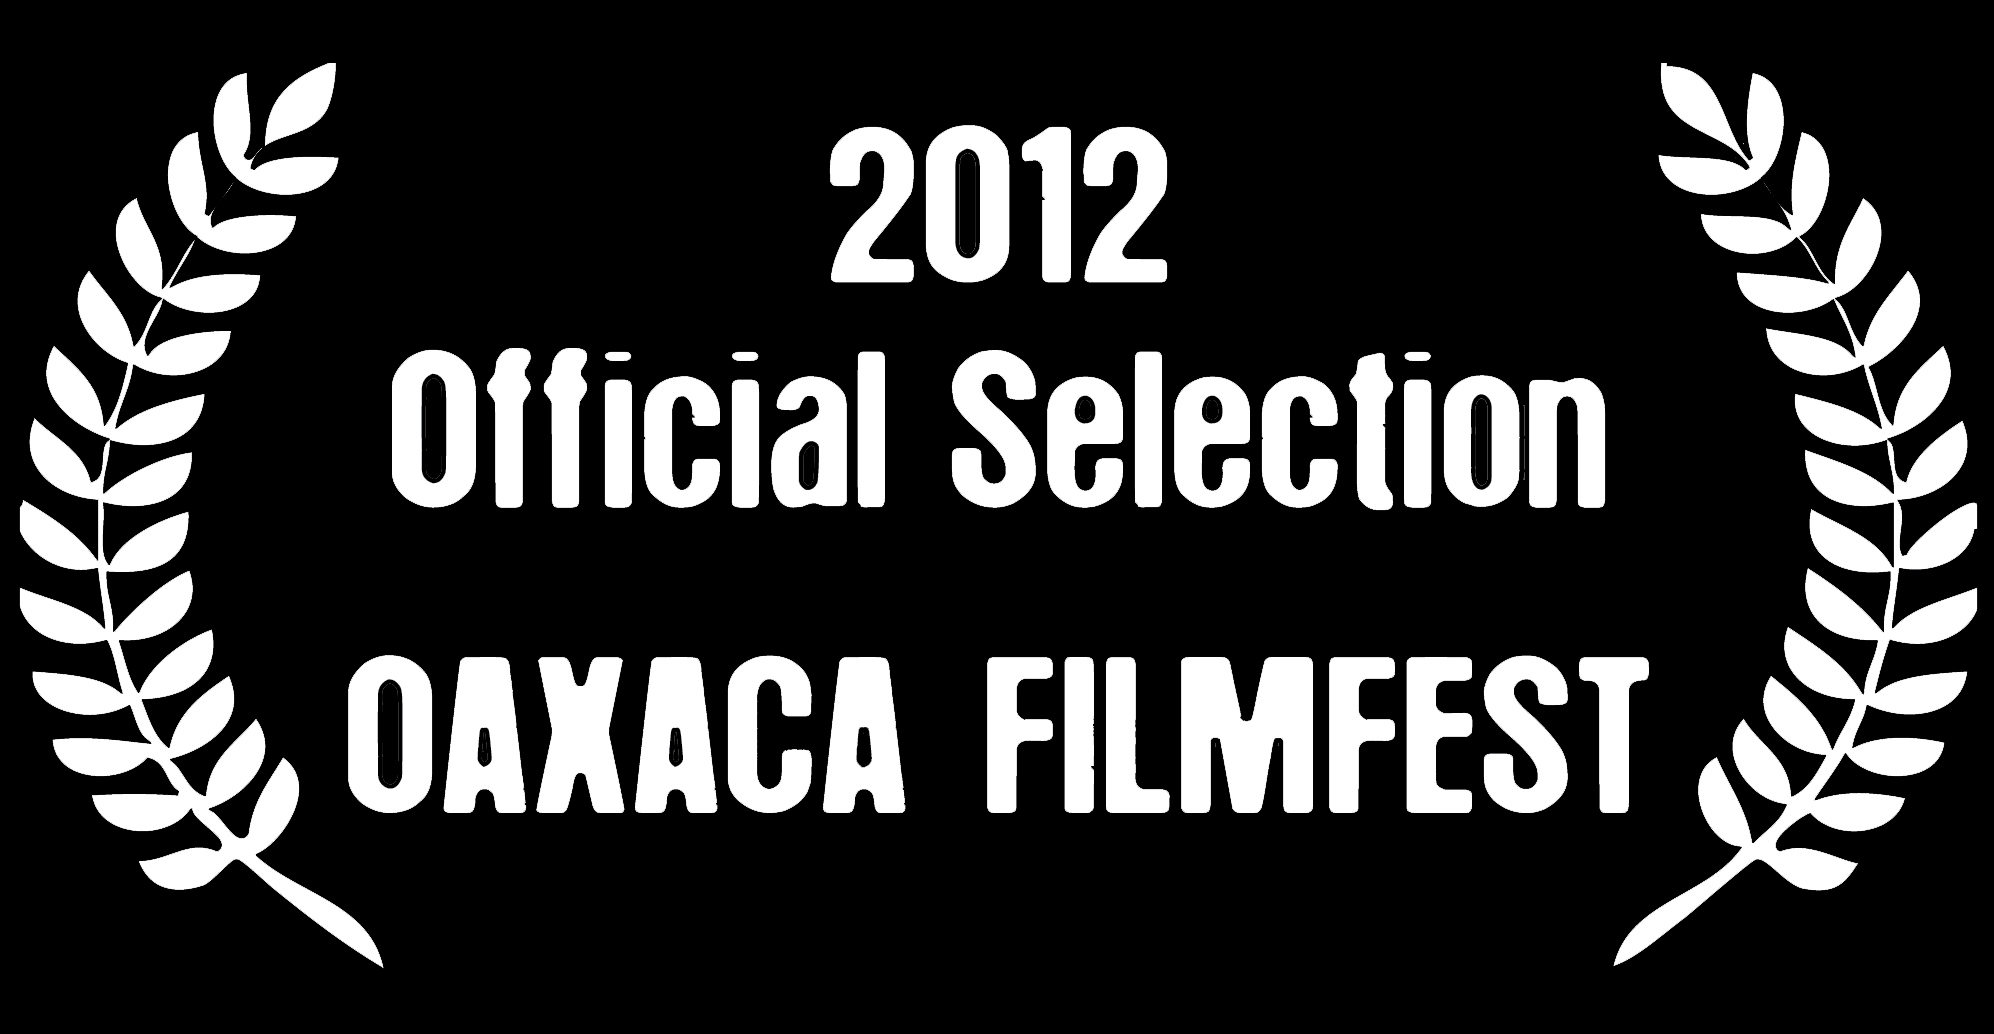 Oaxaca_festival_seal_for_Mexico.jpg